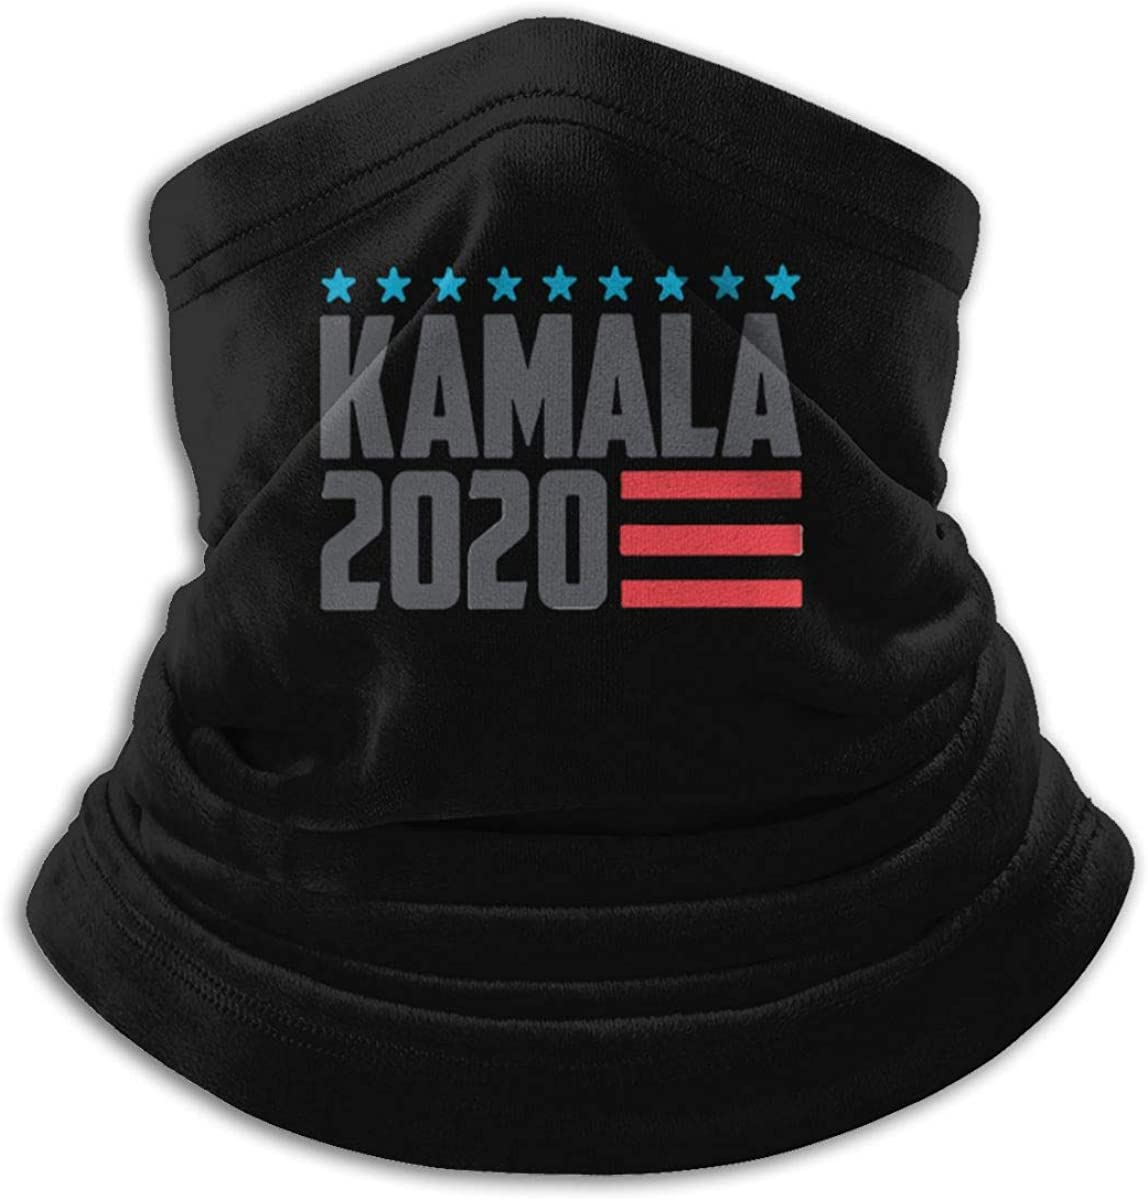 Kamala Harris 2020 Black Multi-function Neck Warmer Gaiter Polyester Neck Warmer Windproof Winter Neck Gaiter Cold Weather Scarf For Men Women